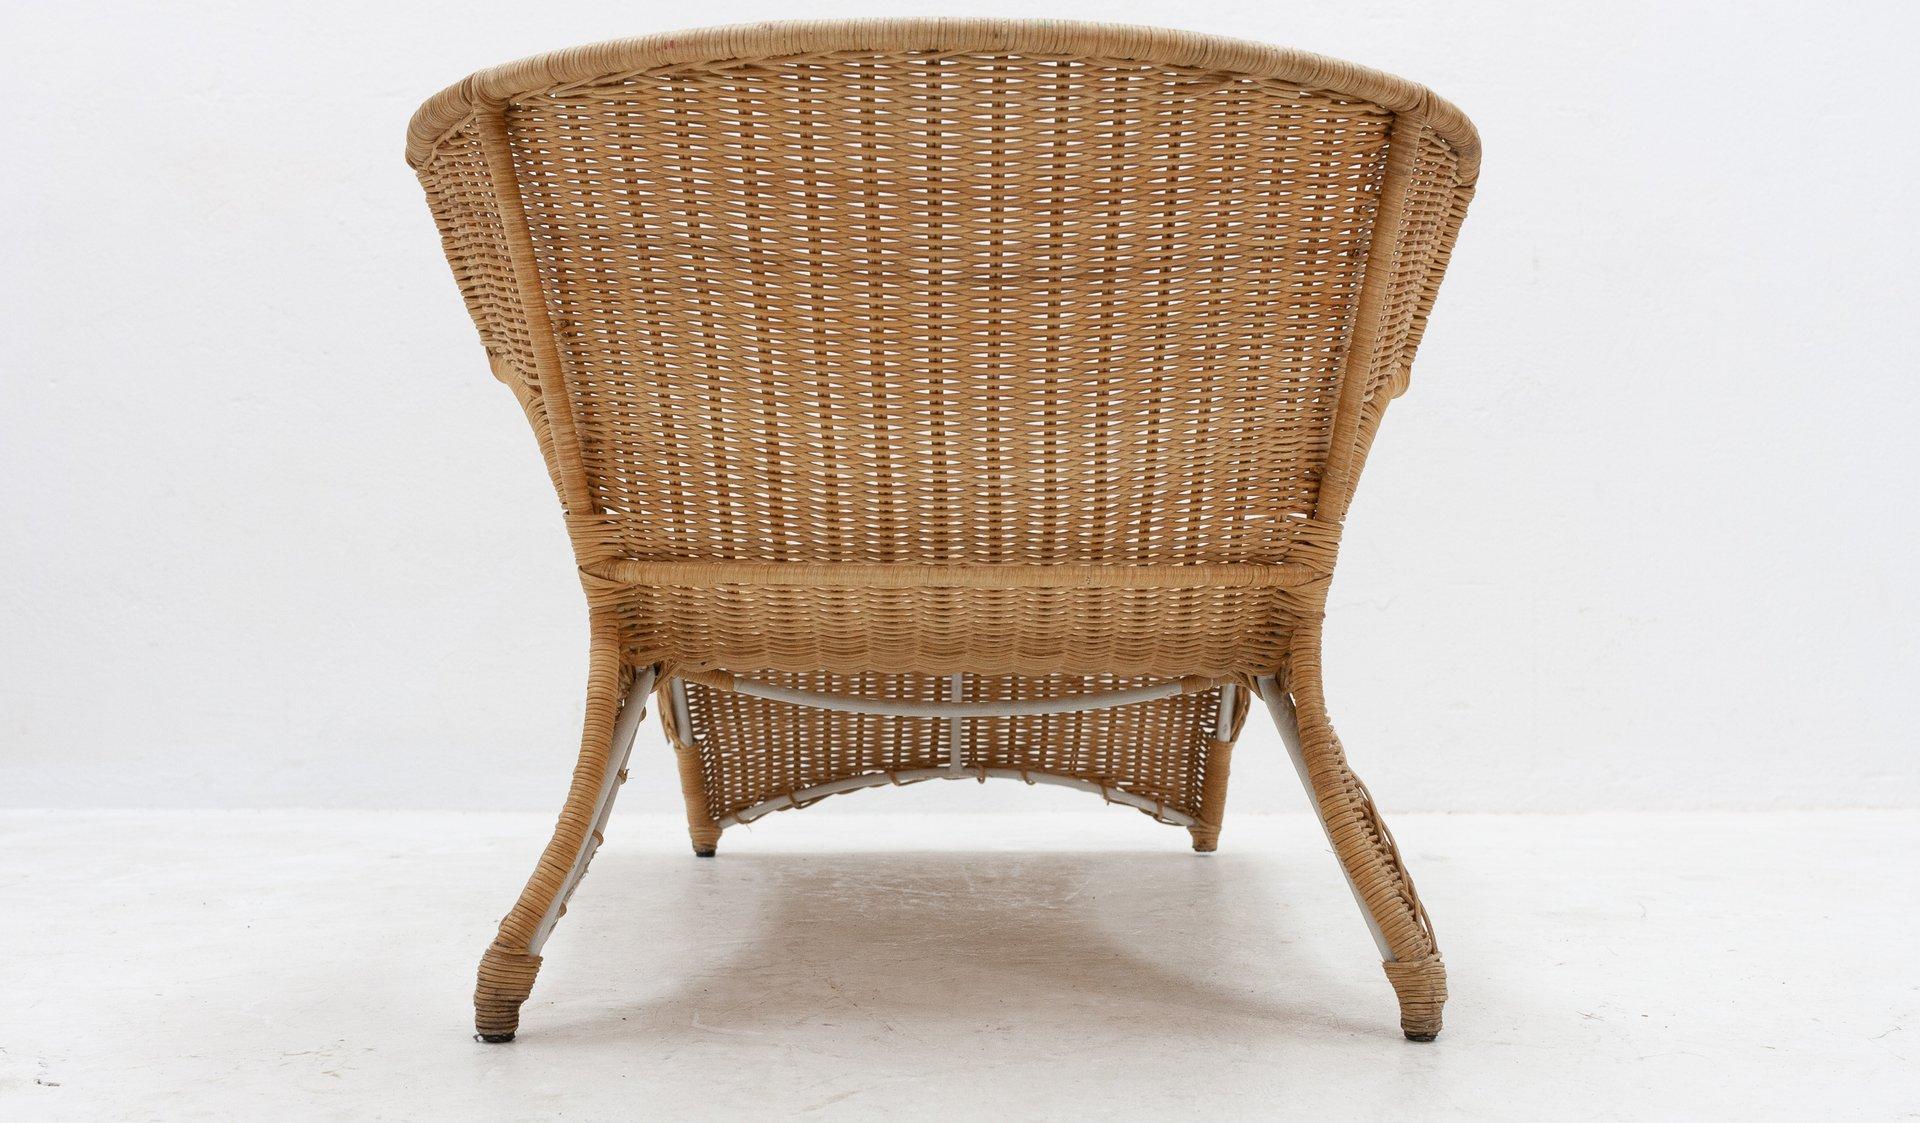 savo sessel von monica mulder f r ikea 2000er bei pamono. Black Bedroom Furniture Sets. Home Design Ideas